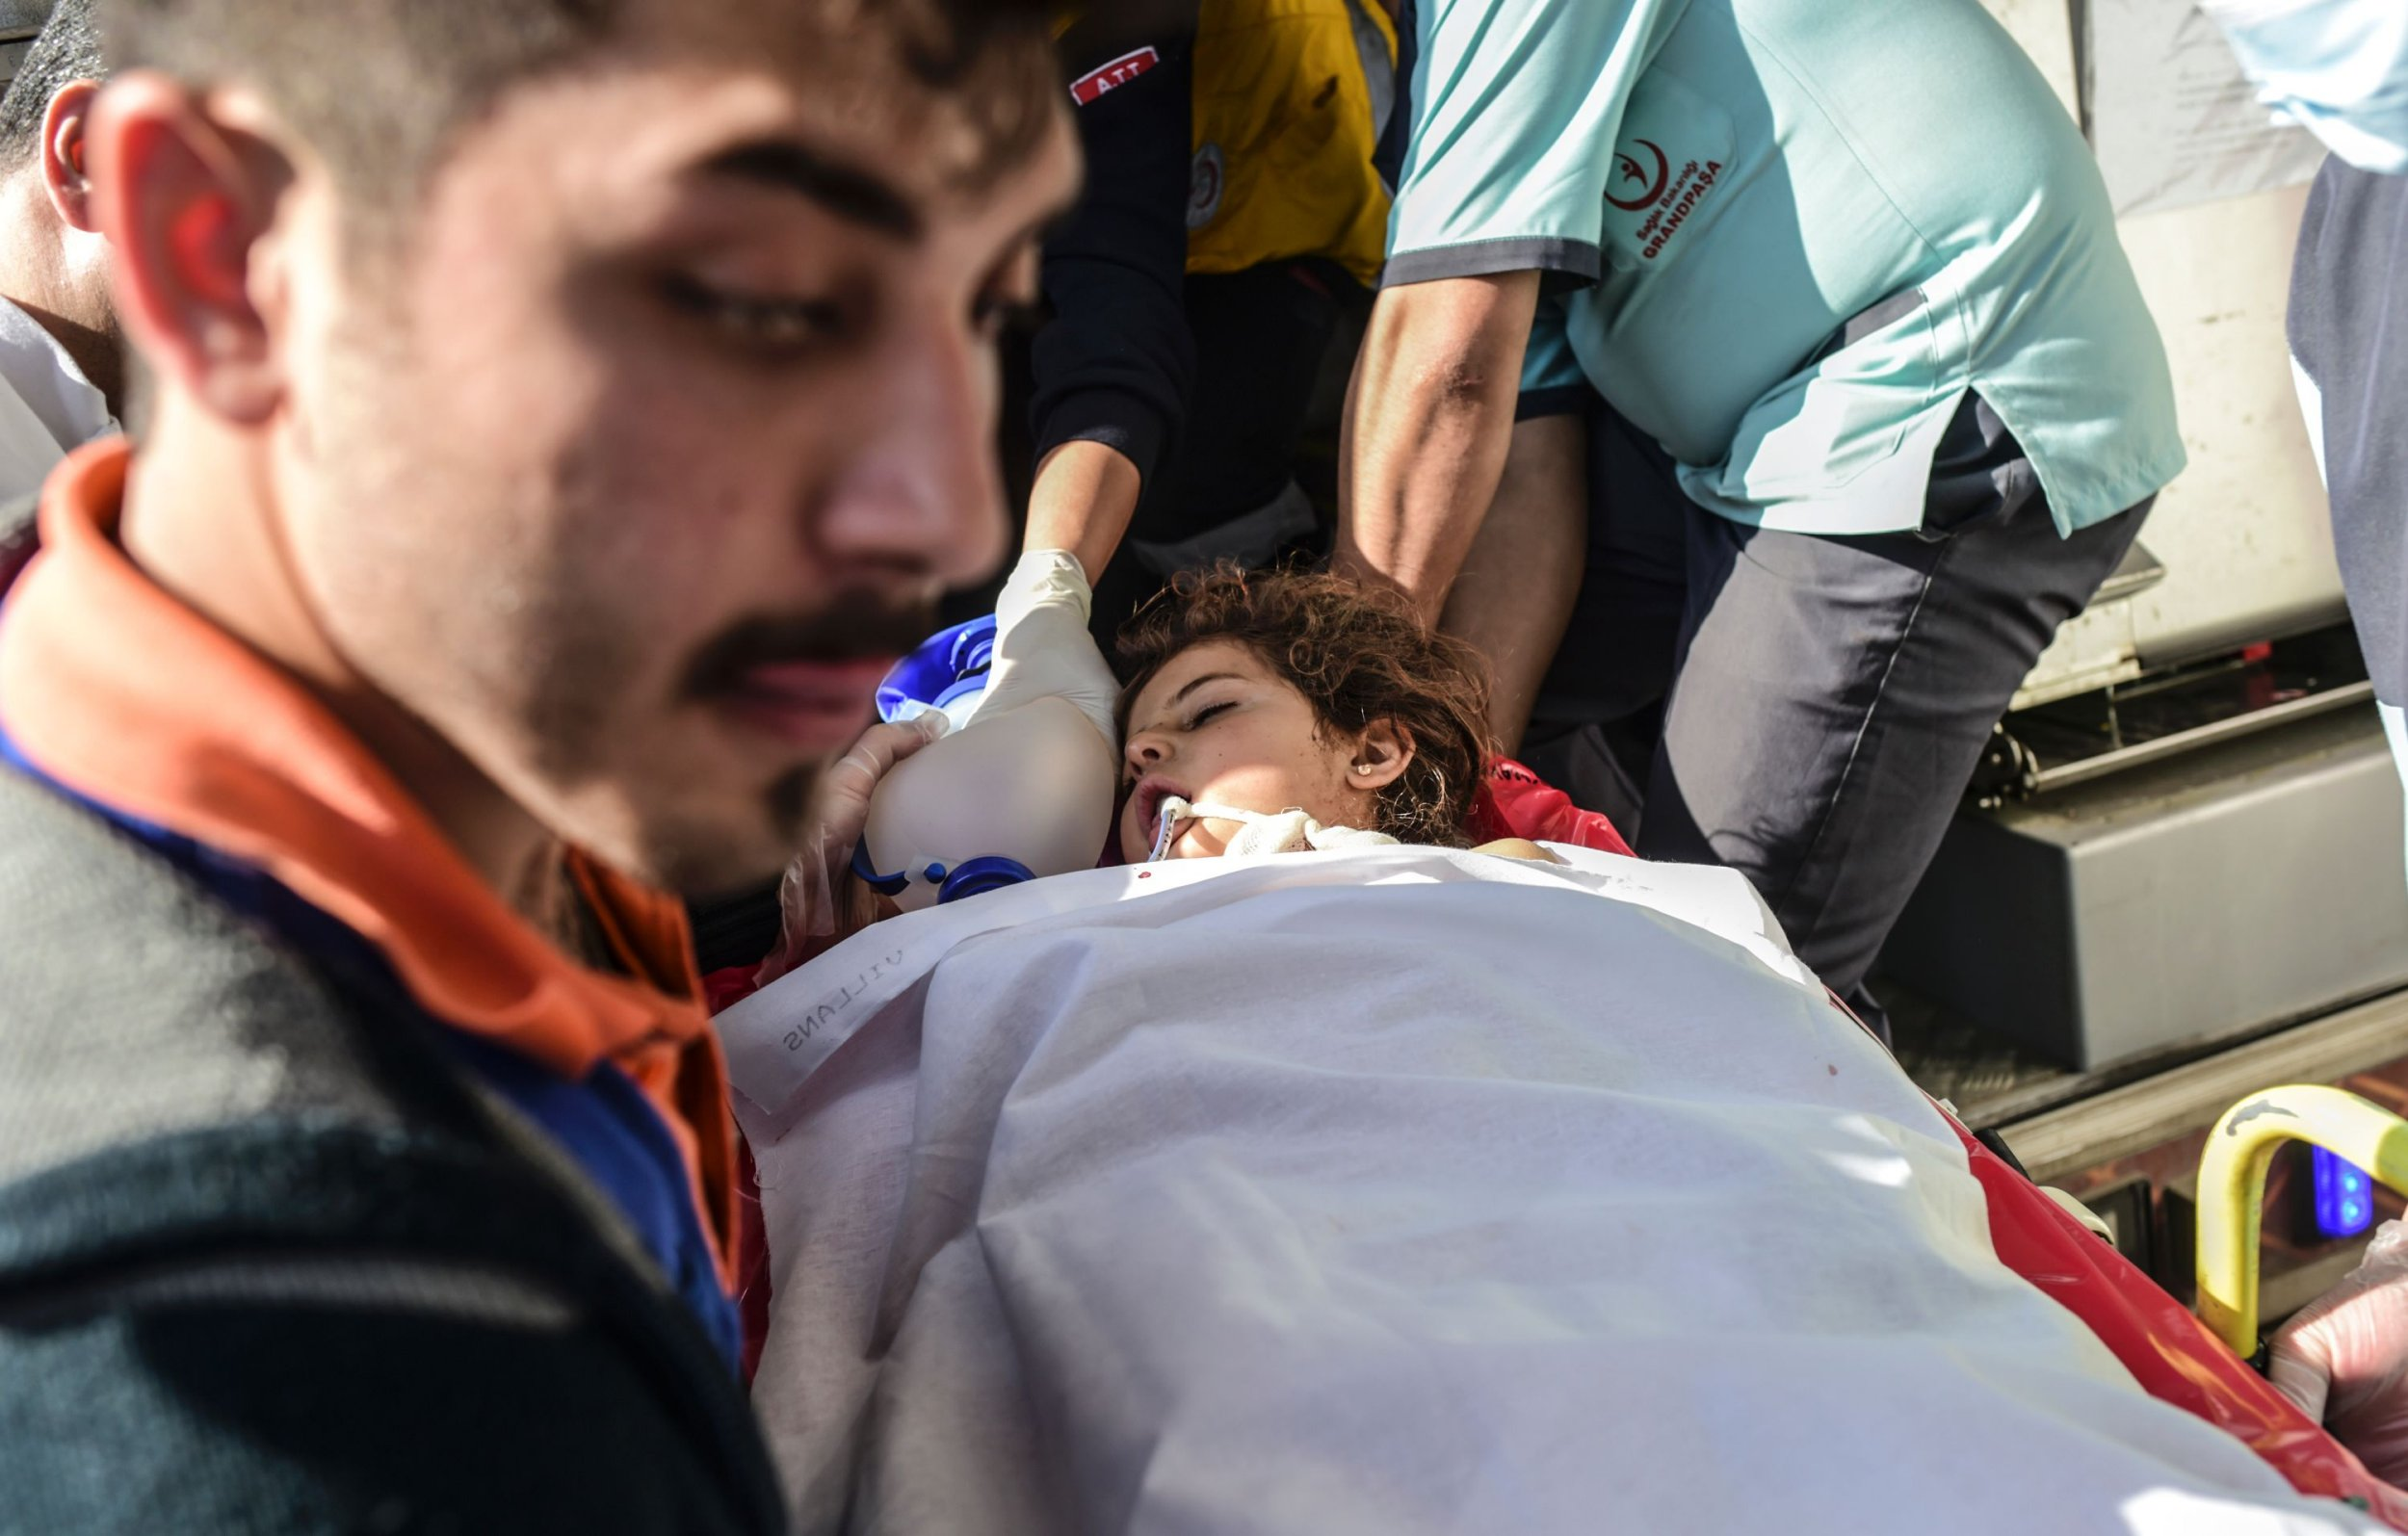 Putin denies hitting hospital and killing civilians in Syrian airstrikes